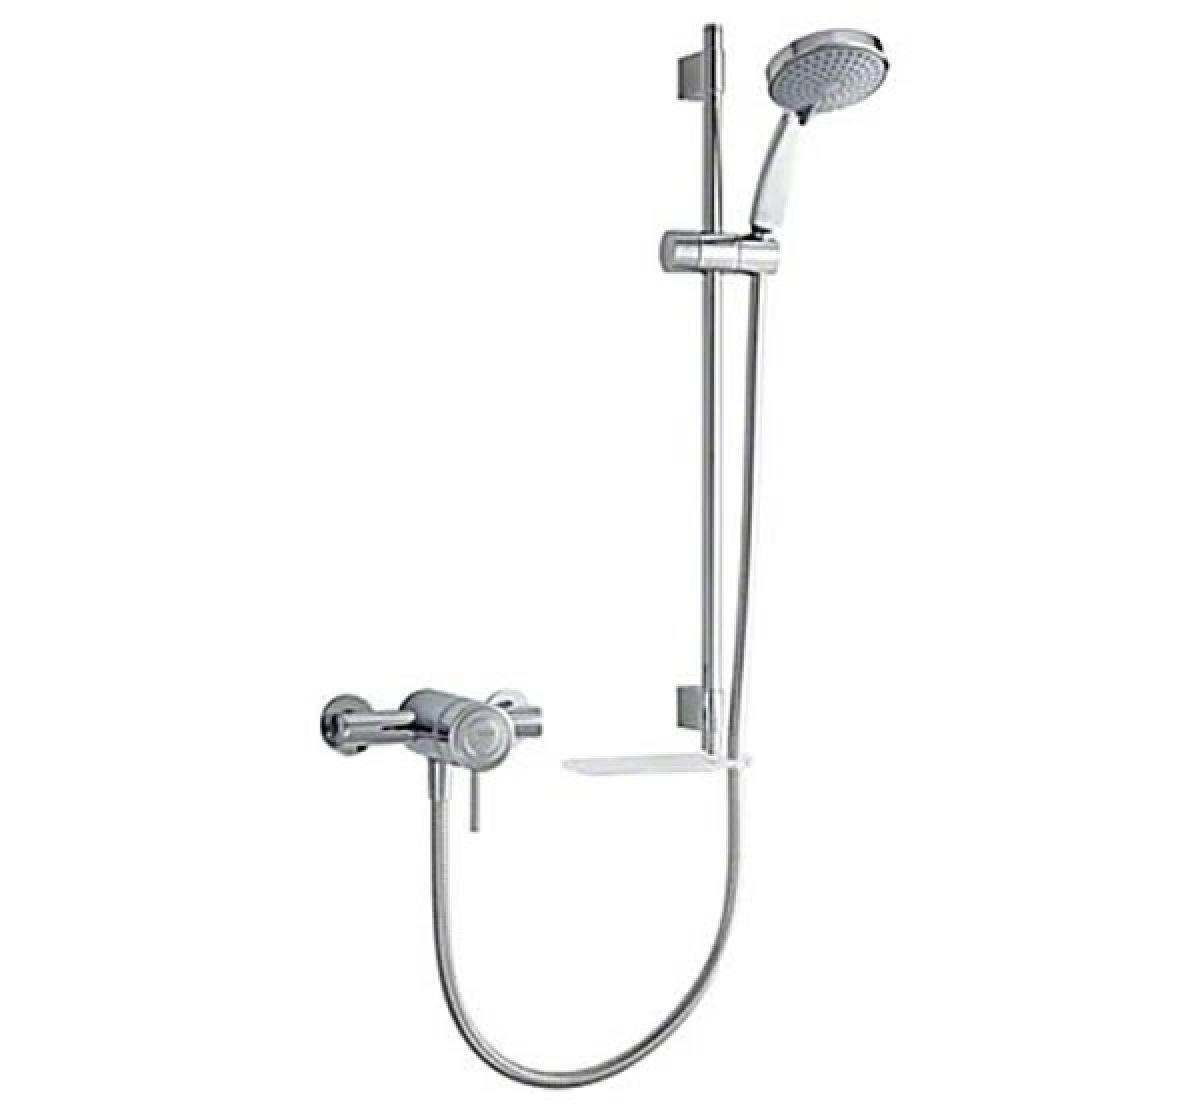 mira element slt thermostatic shower kit ev uk bathrooms mira element slt thermostatic shower kit ev